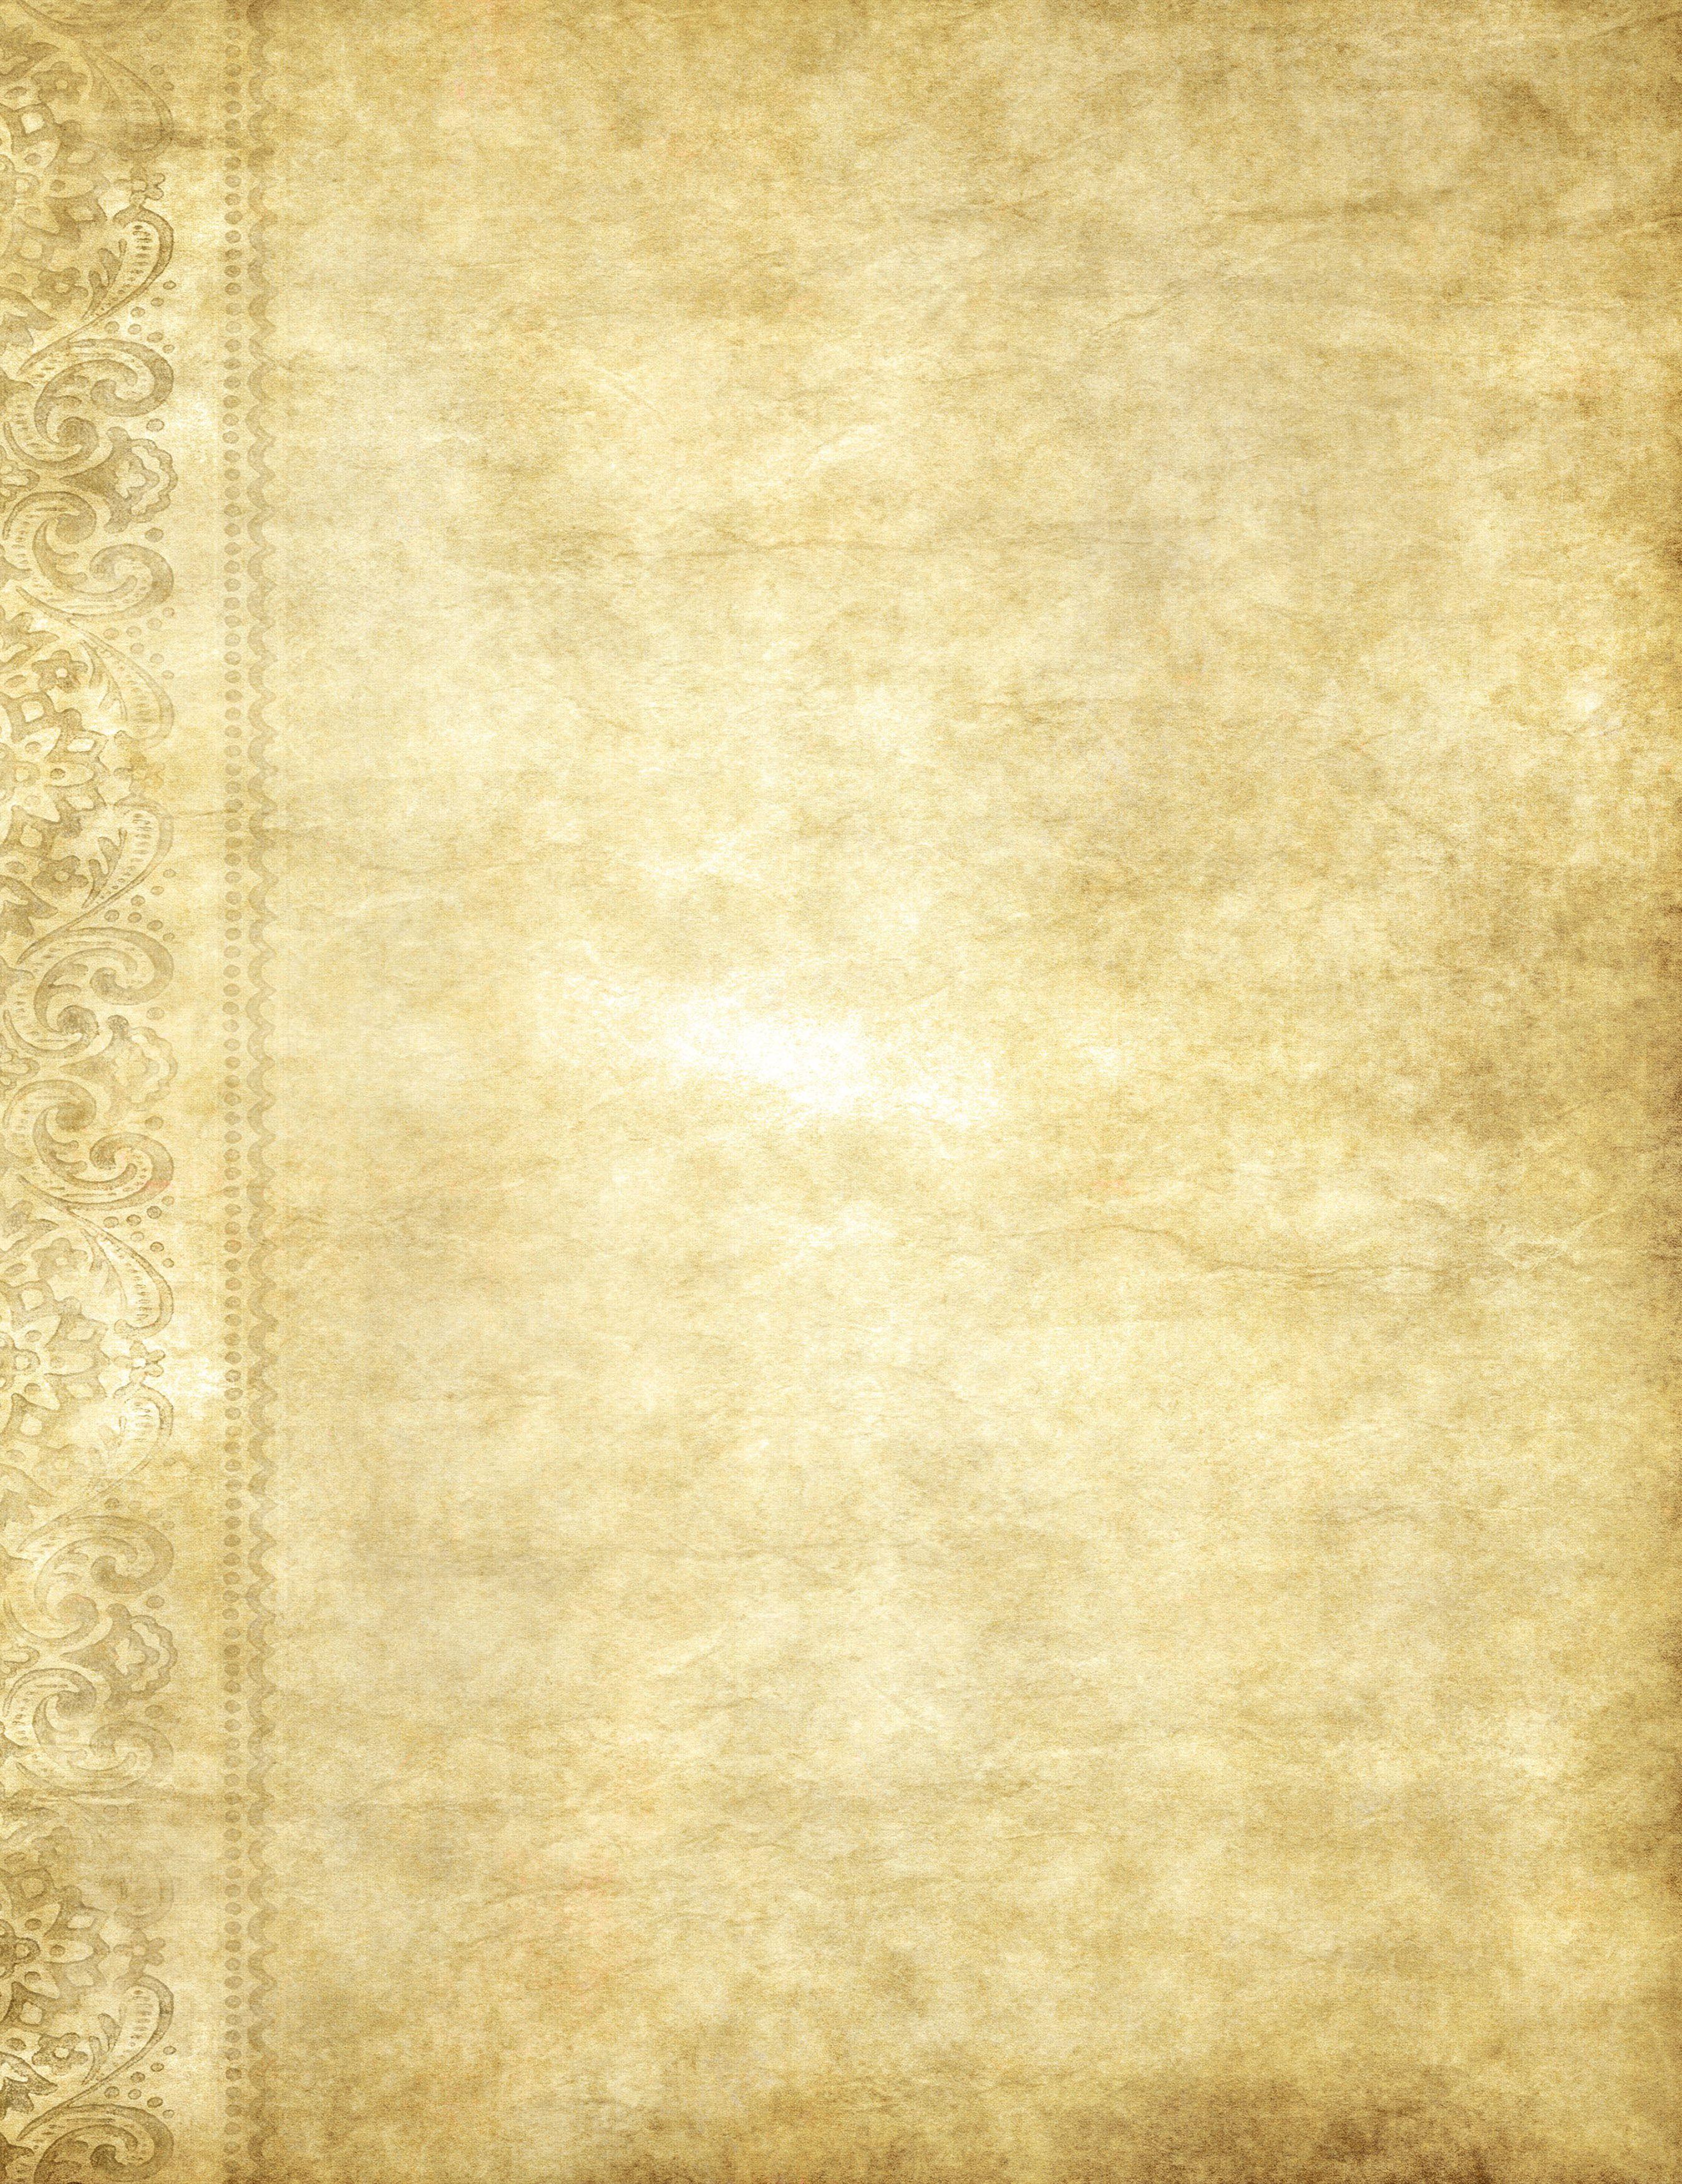 vintage paper texture with design